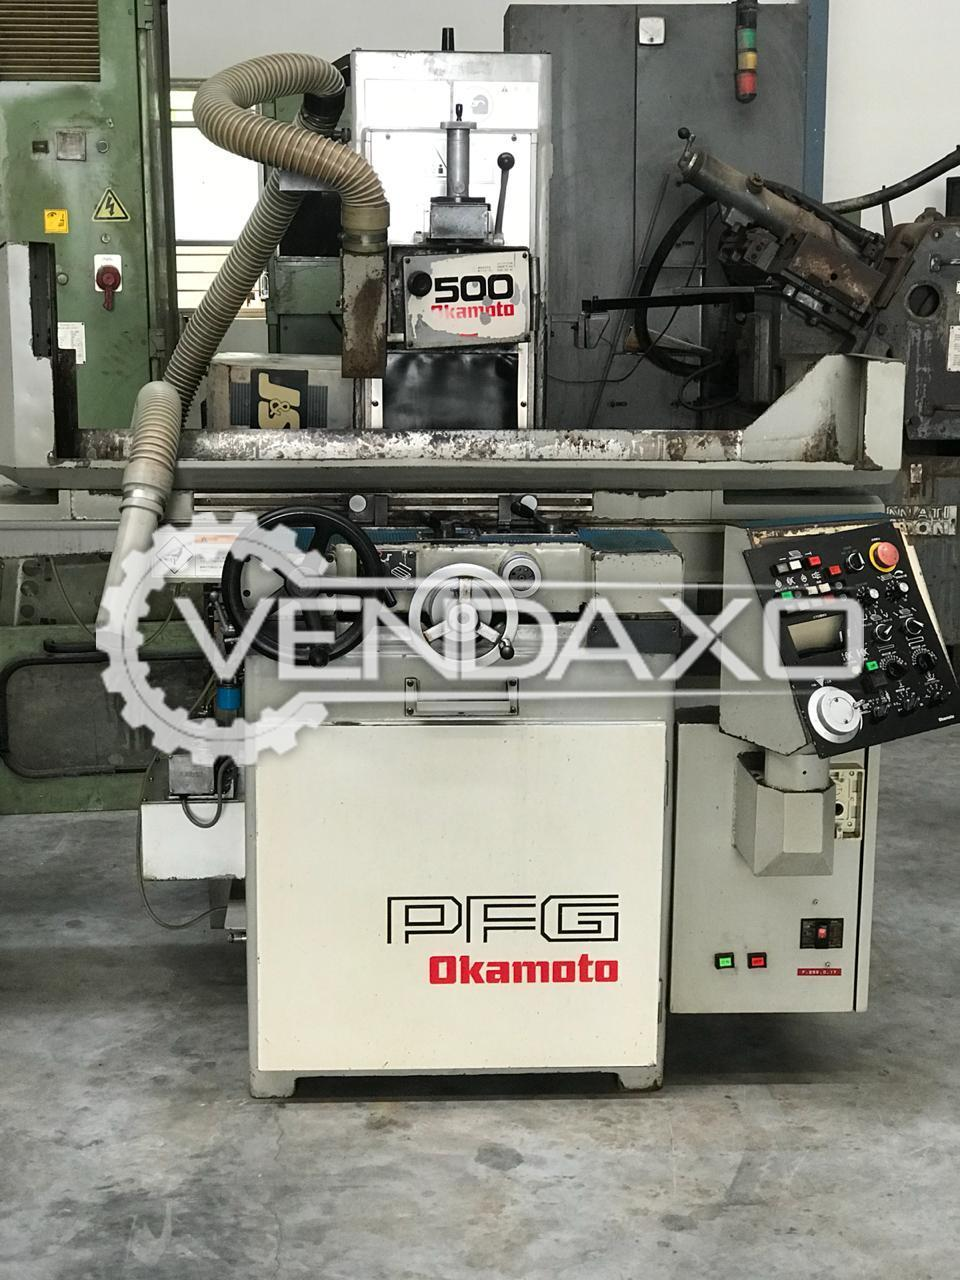 Okamoto PFG-500 Surface Grinding Machine - Length - 600 mm , Width - 140 mm